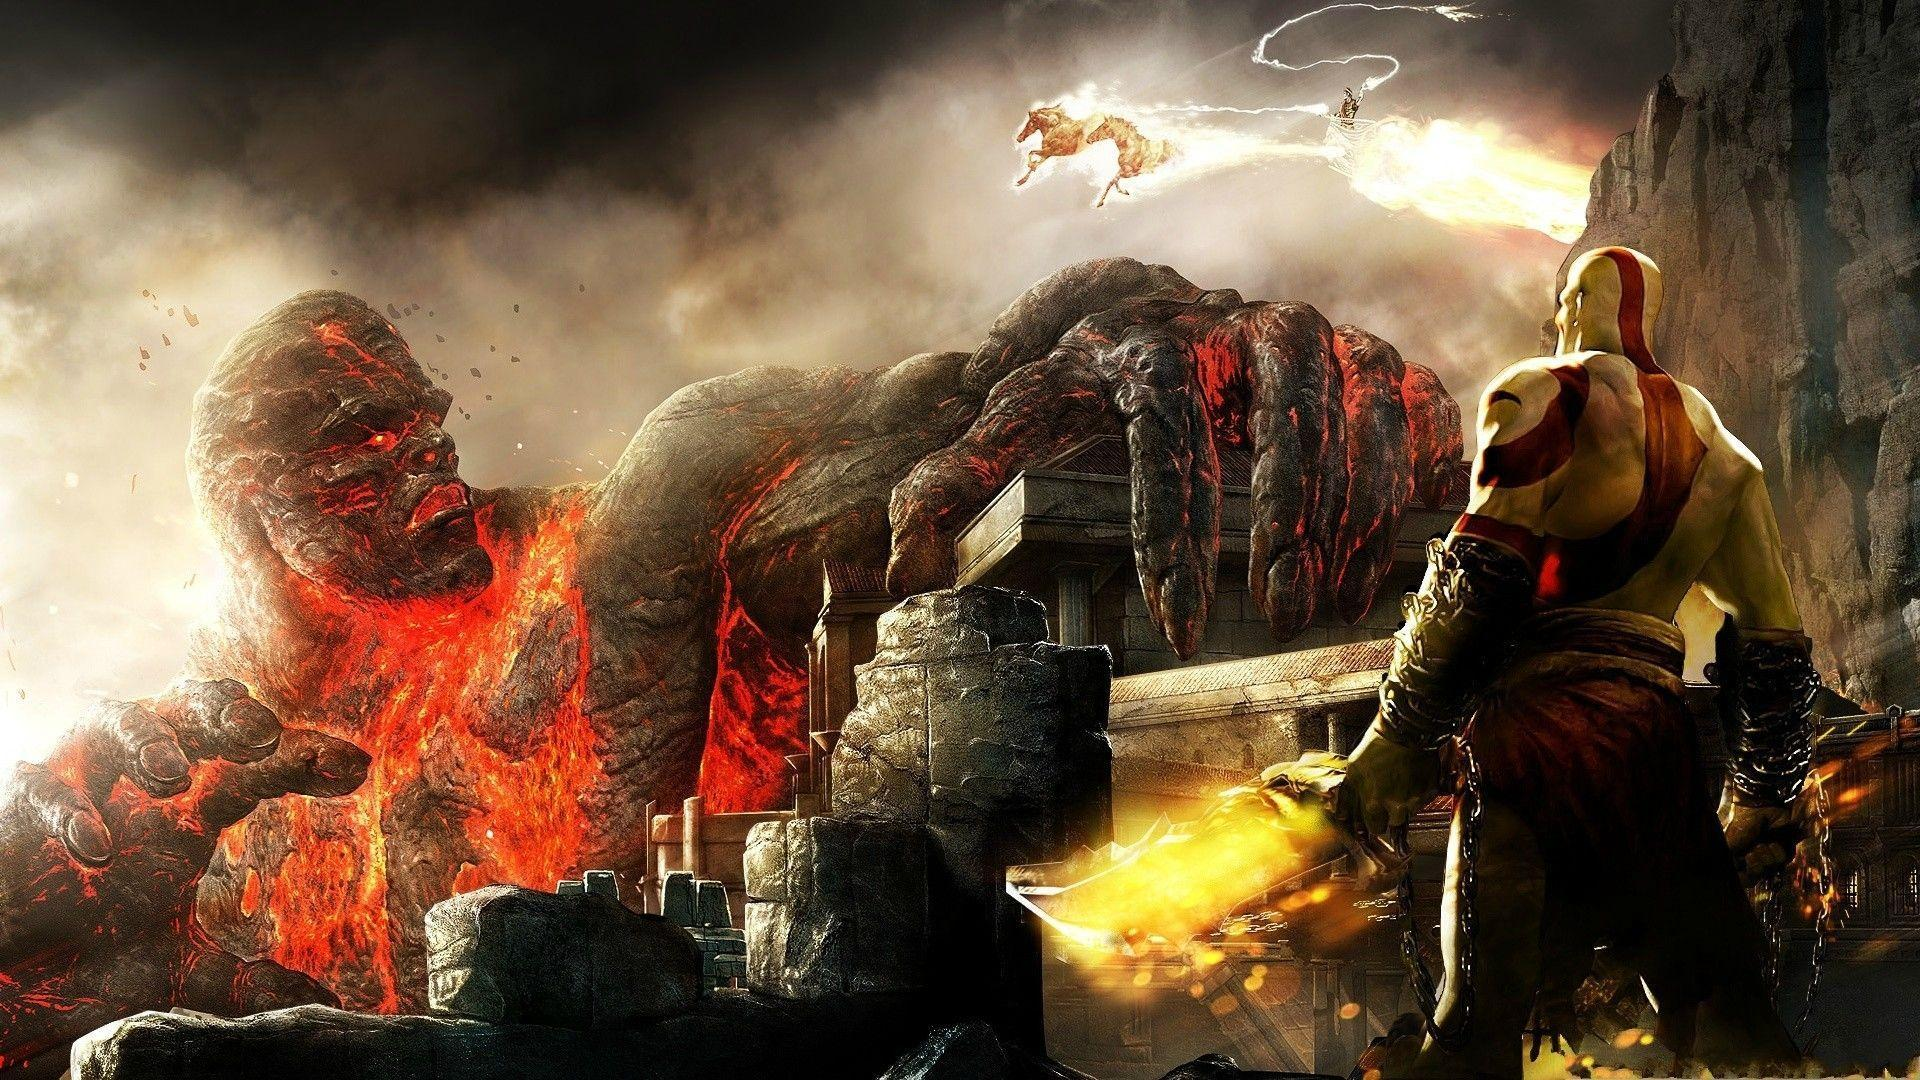 God Of War Computer Wallpapers, Desktop Backgrounds | 1920x1080 ...